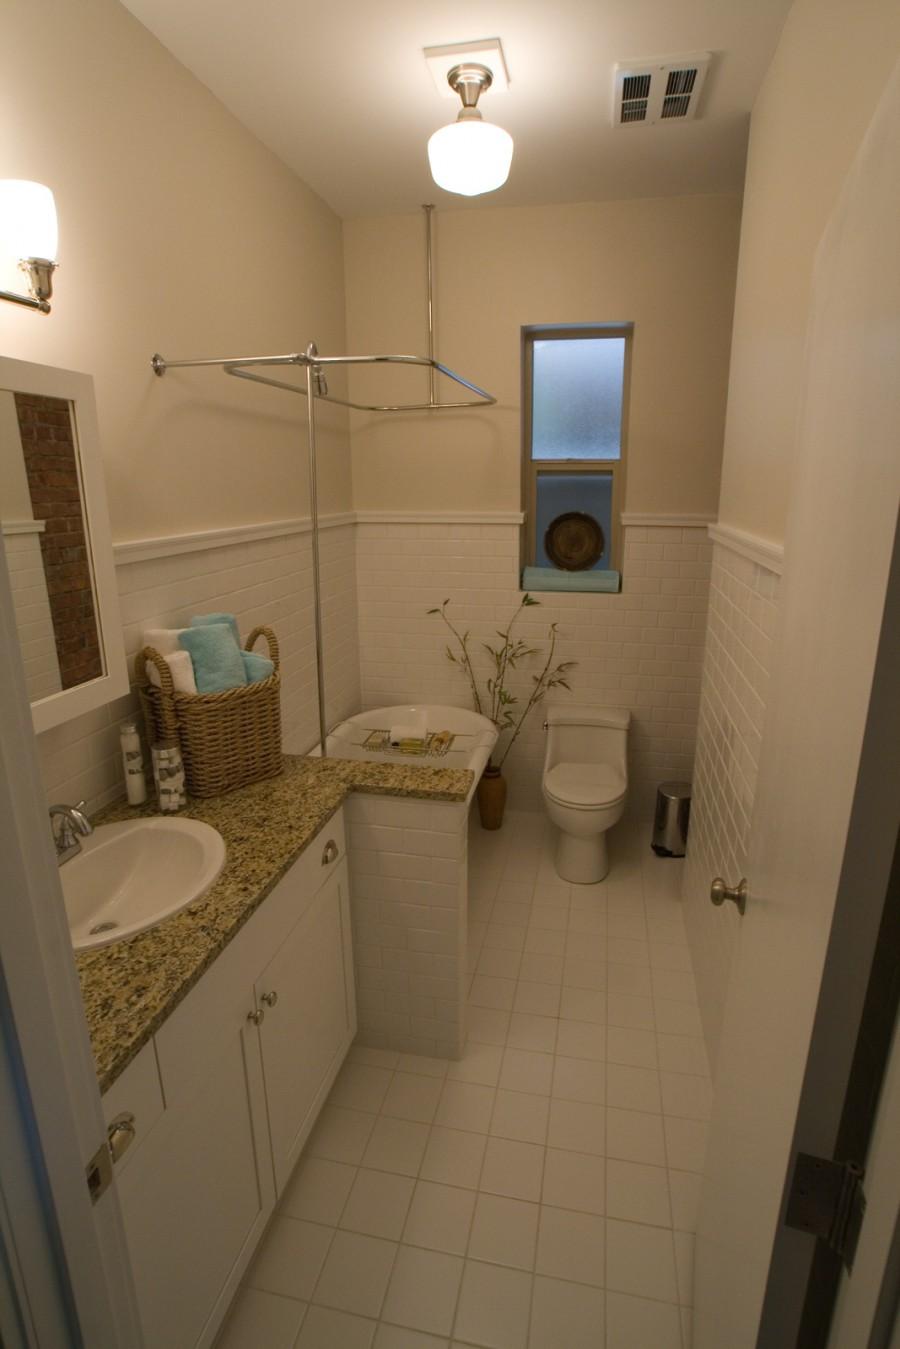 bathroom-vintage-small-bathroom-remodels-with-subway-tile-bathroom-and-marble-composite-kitchen-sinks-subway-tile-bathroom-900x1349